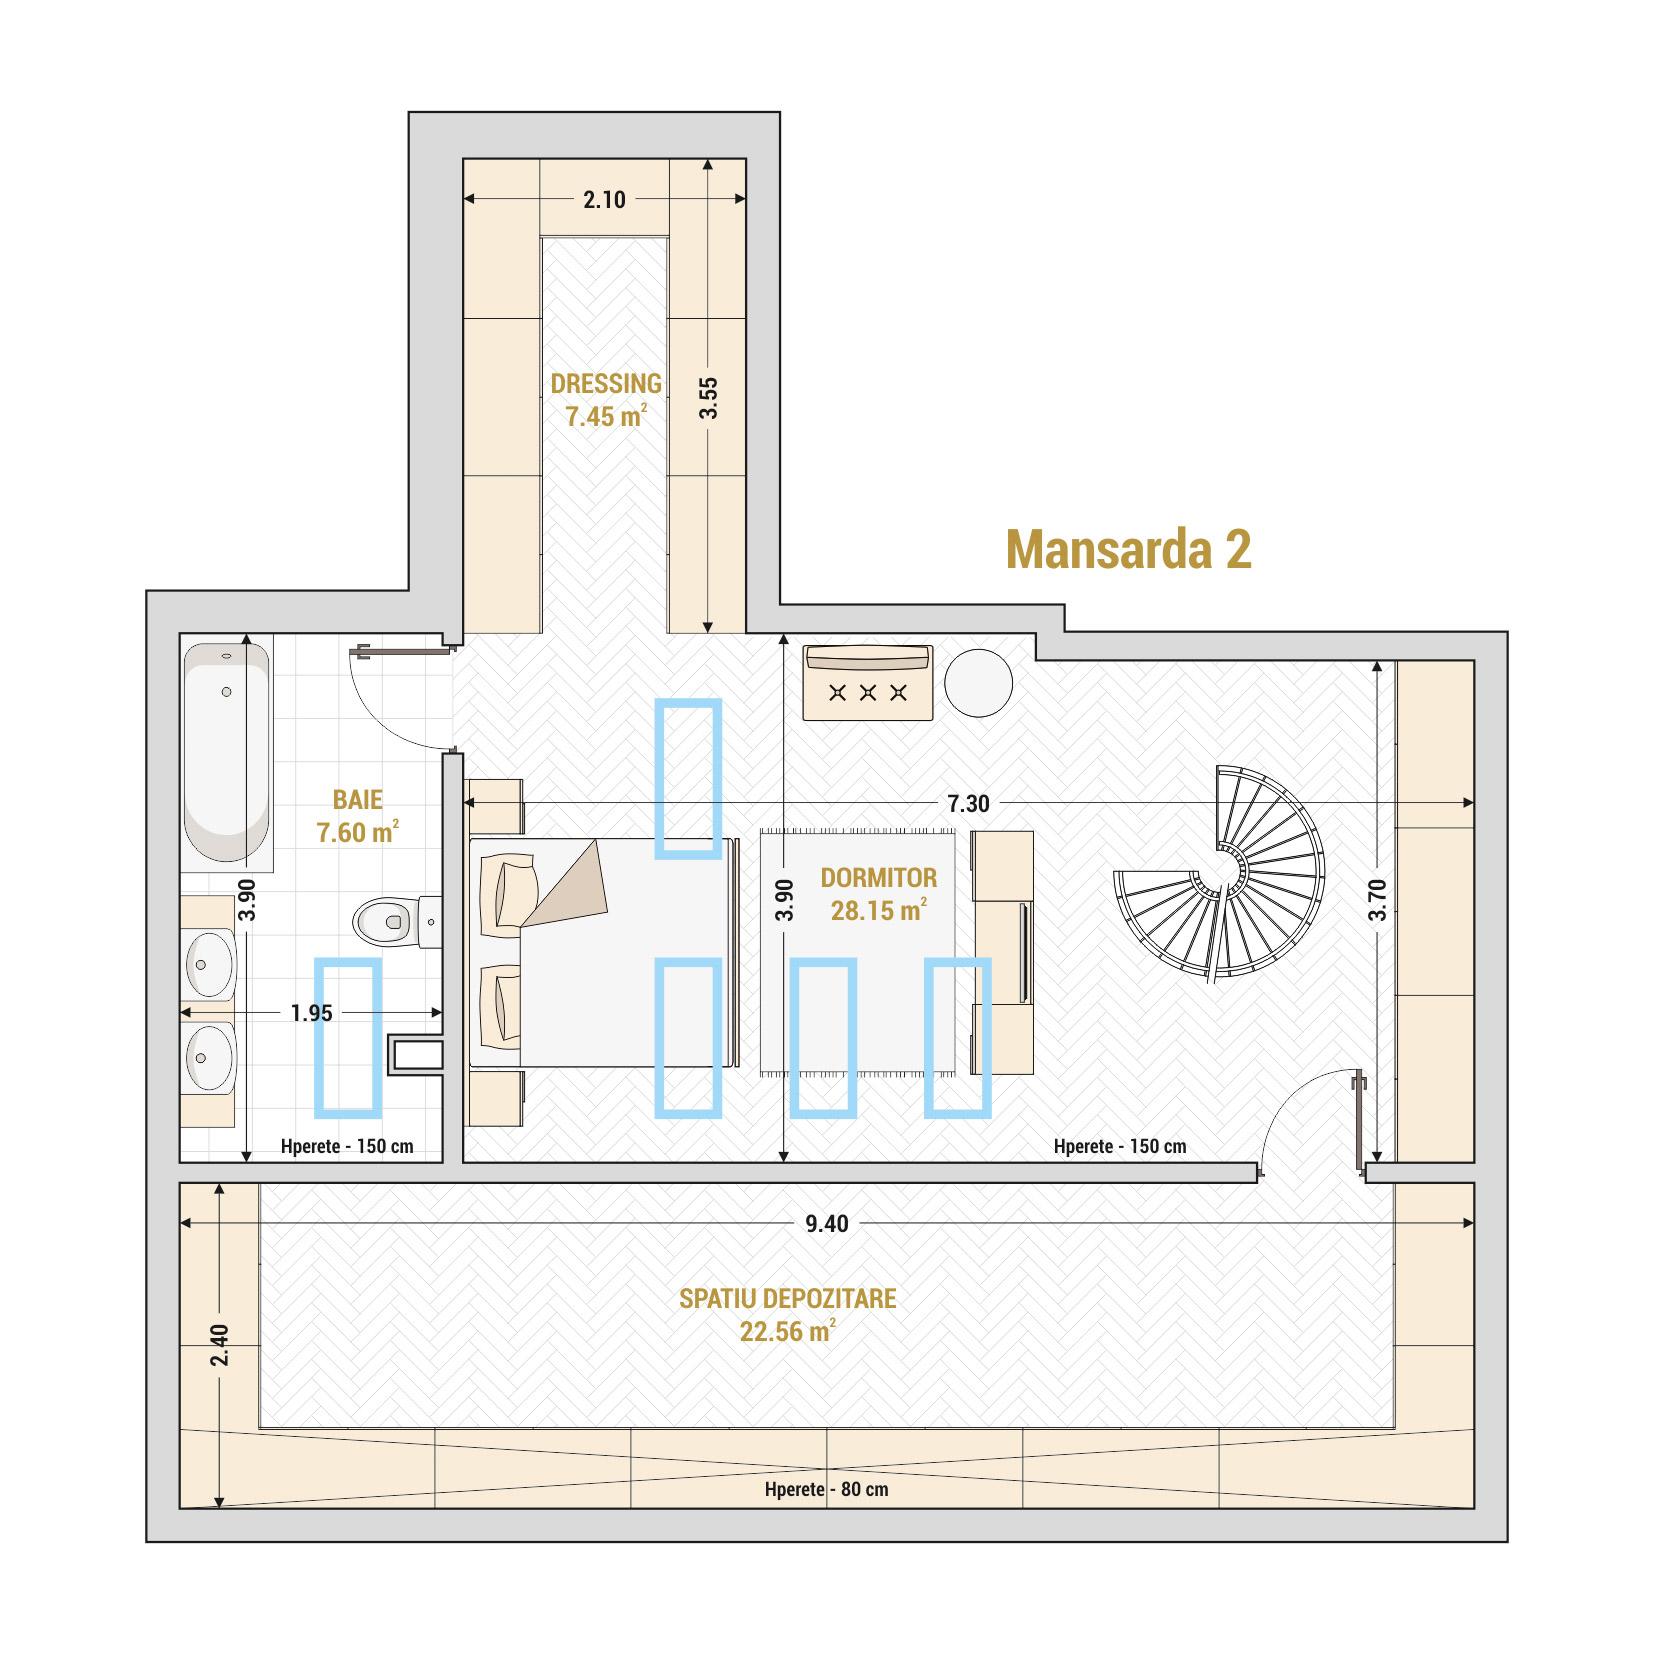 Duplex 3 camere de vanzare Bucuresti - Catedral Residence - Marriott, Piata Unirii, 13 Septembrie, Izvor - T2 - B